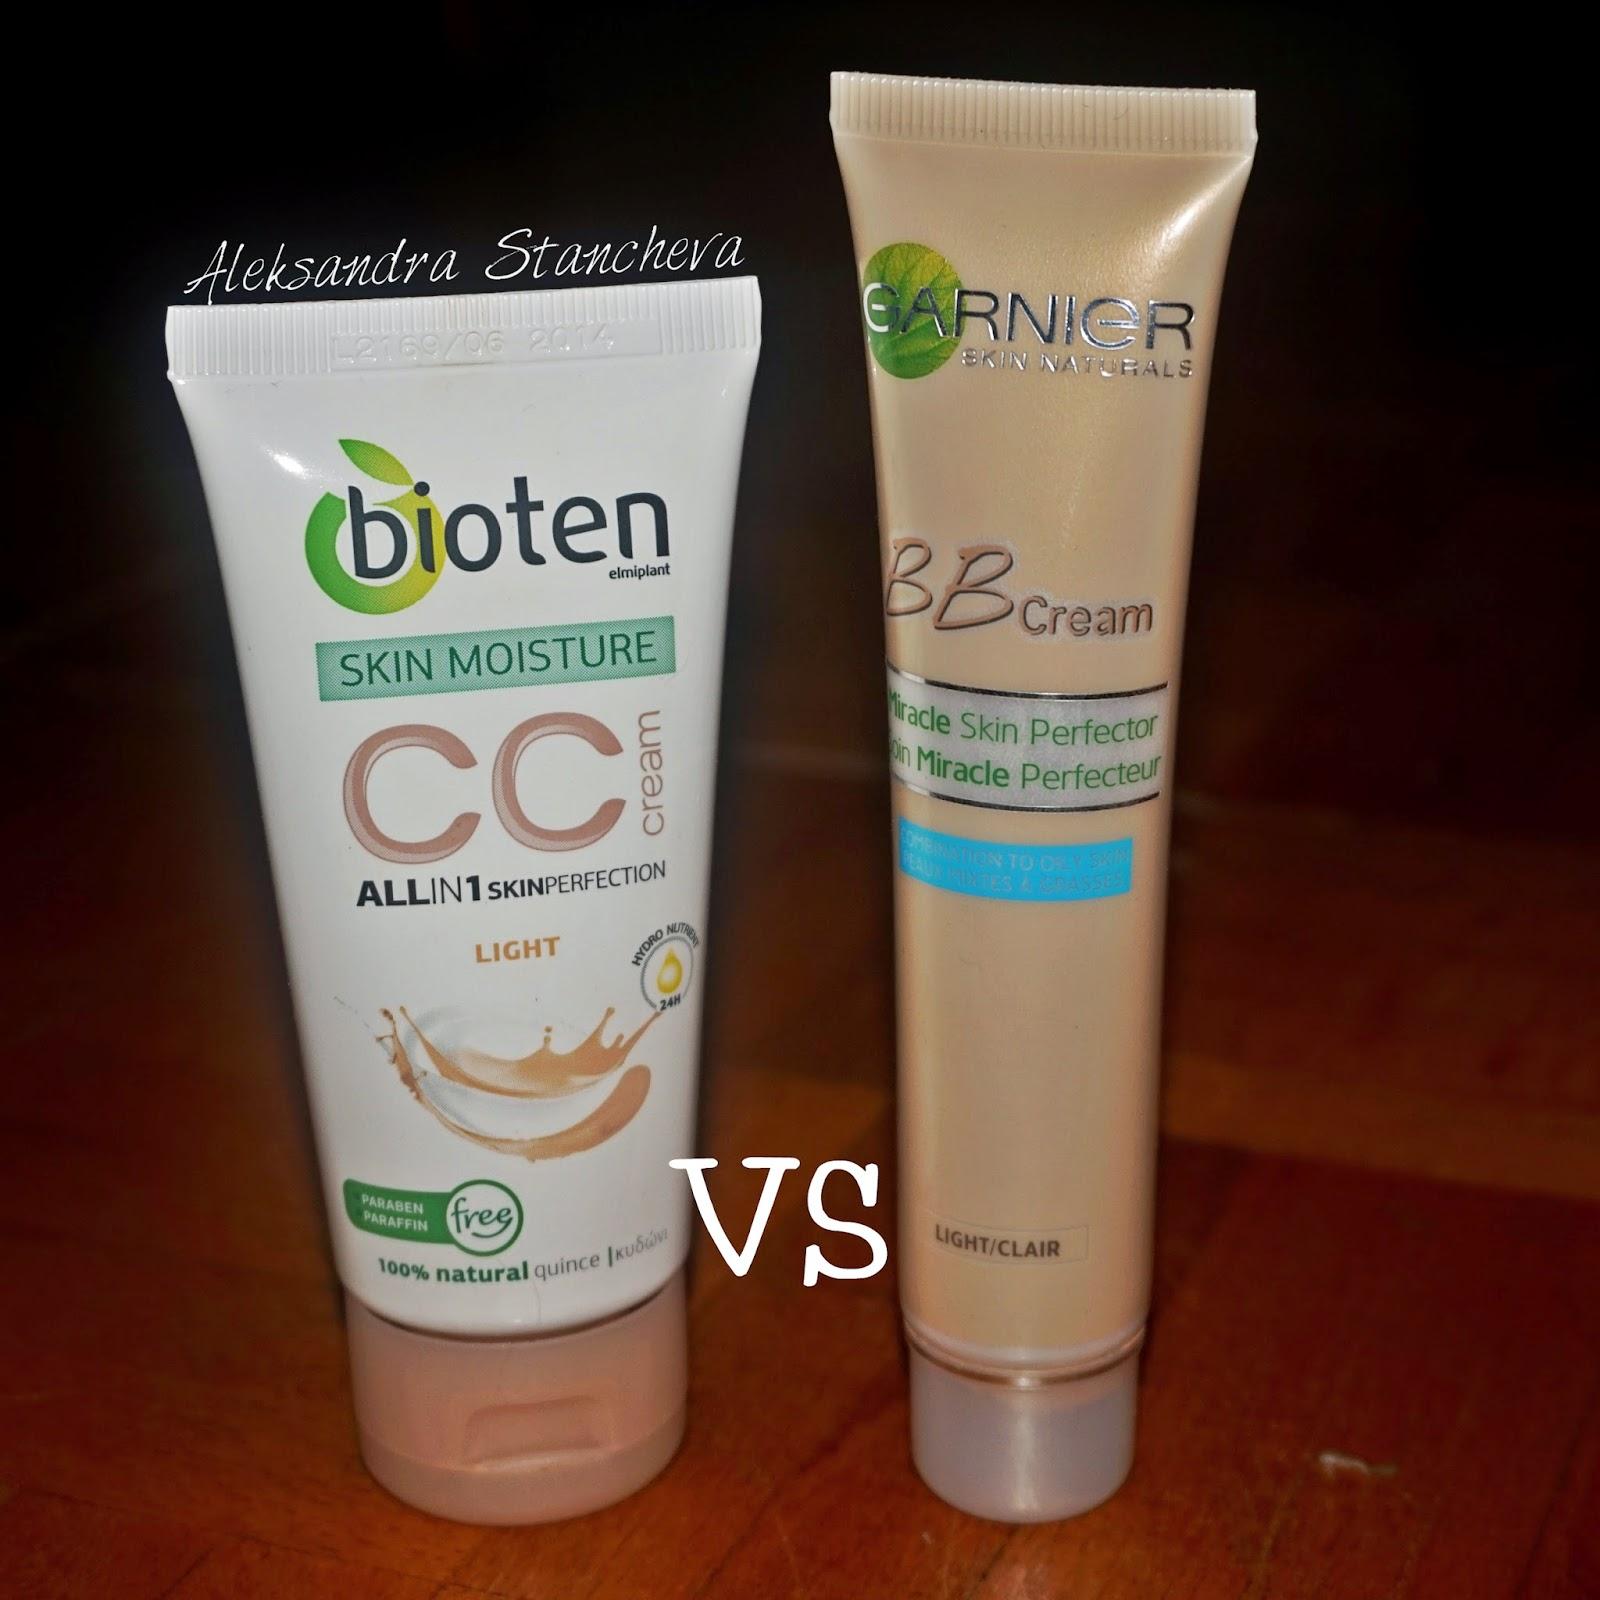 garnier bb cream vs bioten cc cream. Black Bedroom Furniture Sets. Home Design Ideas